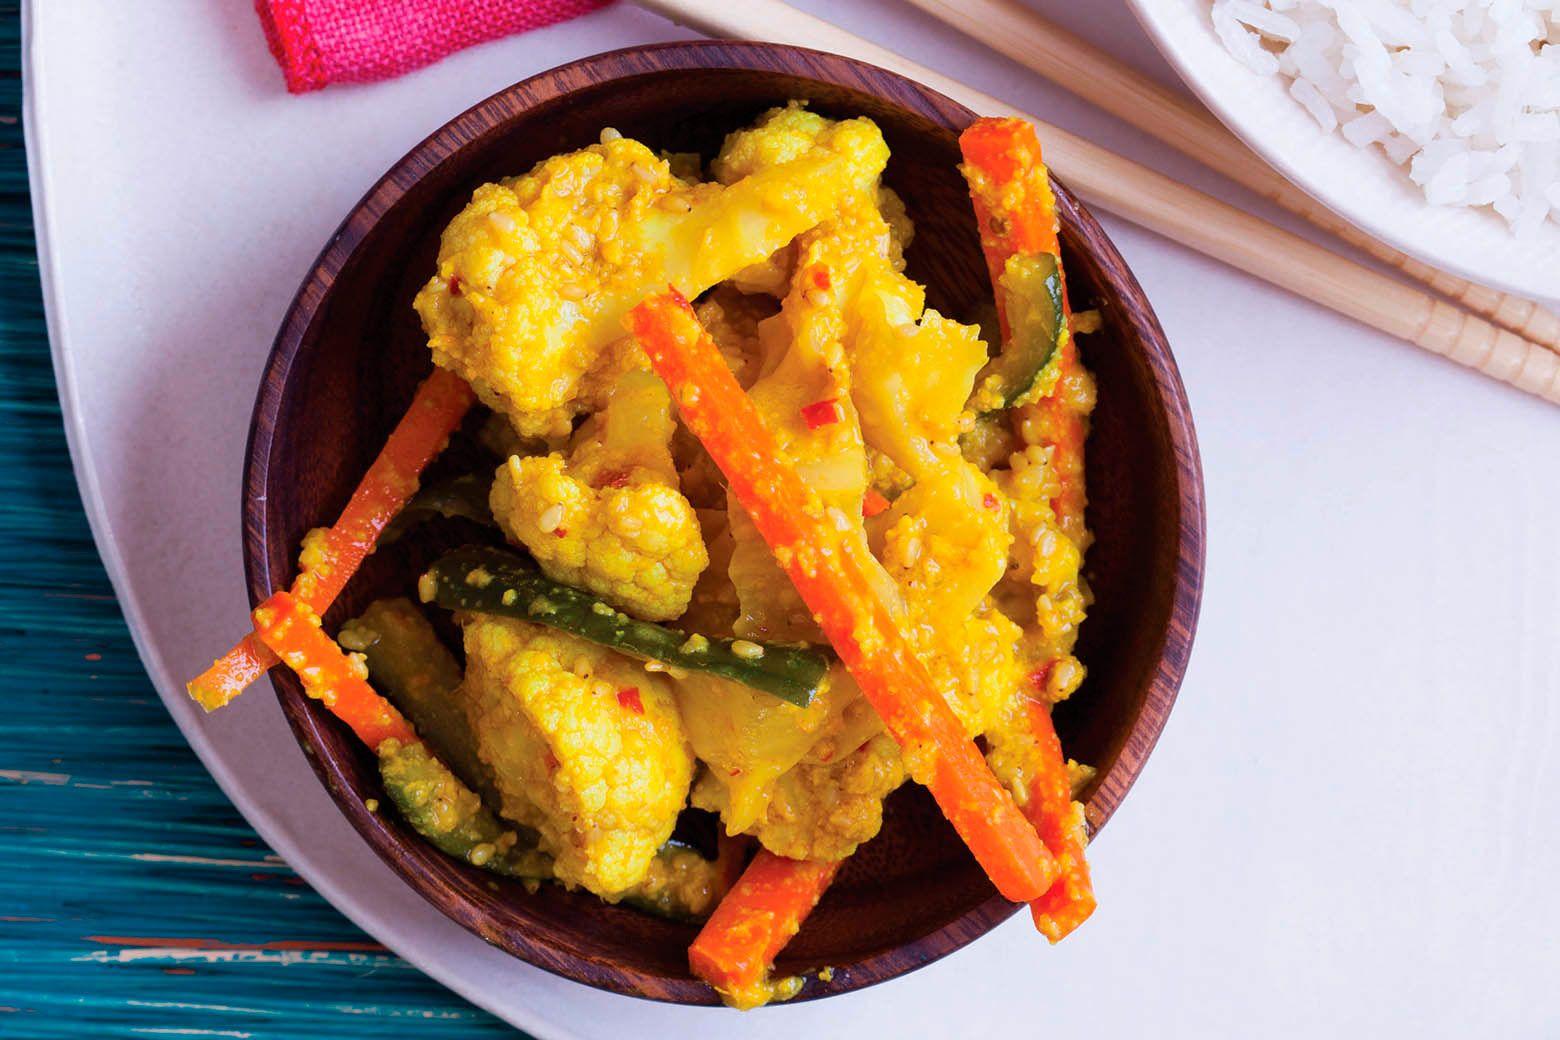 Malaysian pickled vegetables by karen solomon